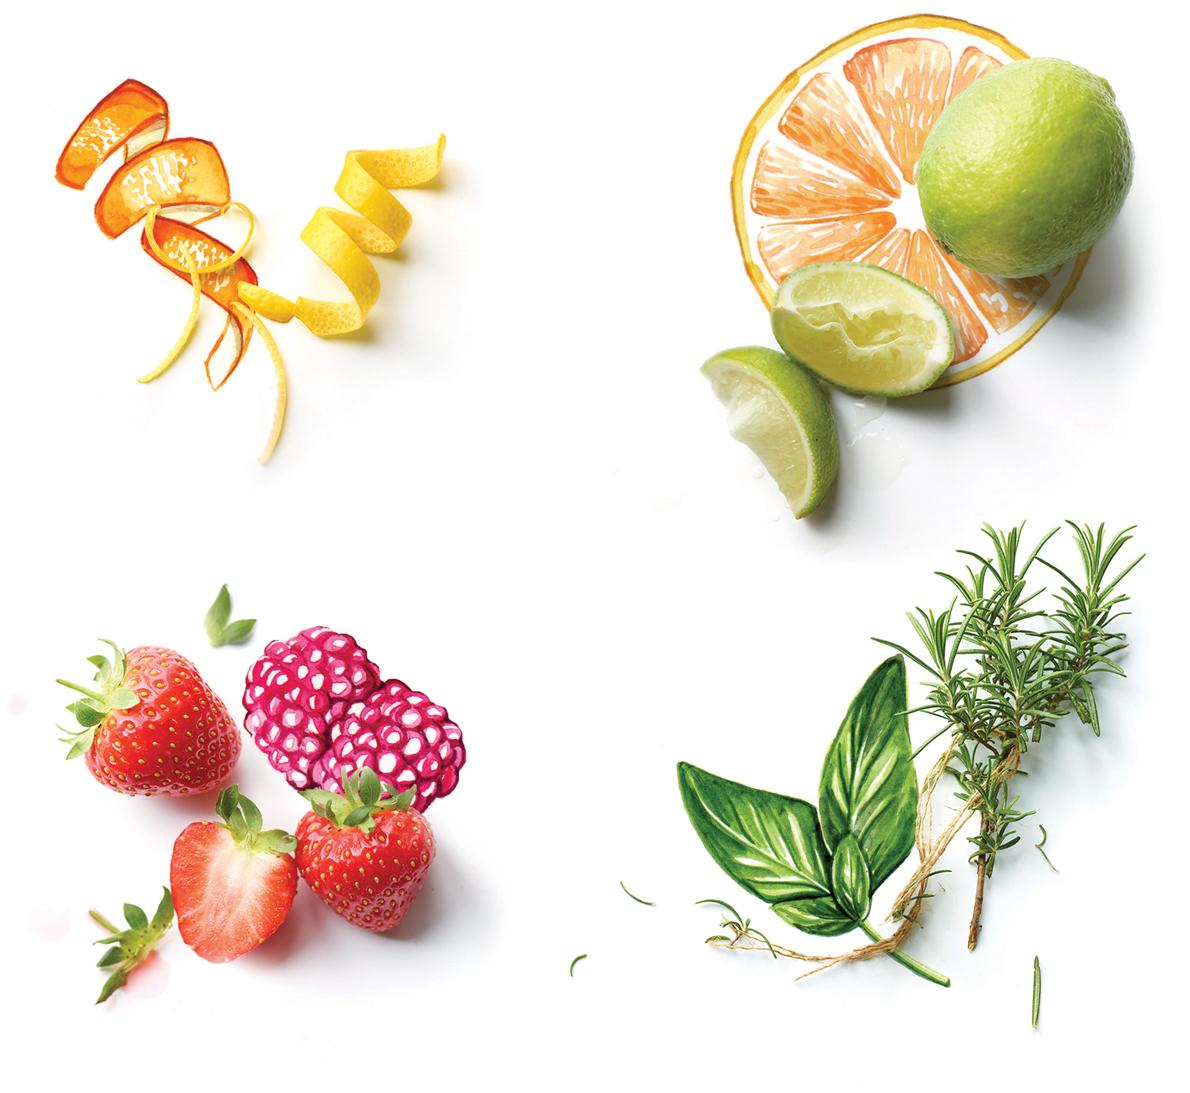 Food illustration photography collaboration for Waitrose